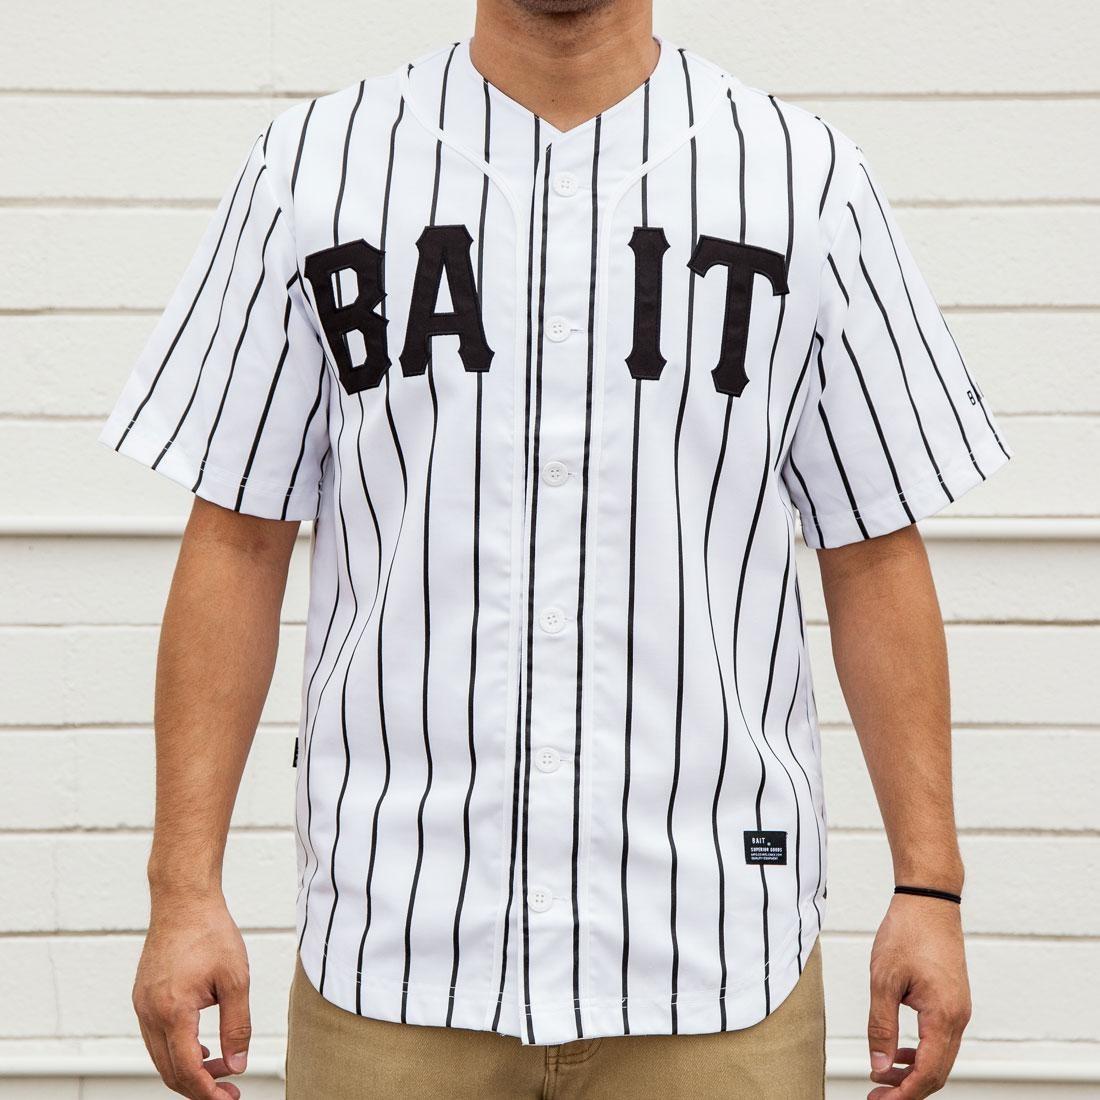 BAIT Men Sluggers Baseball Jersey - Pinstripe (white / black / pinstripe)